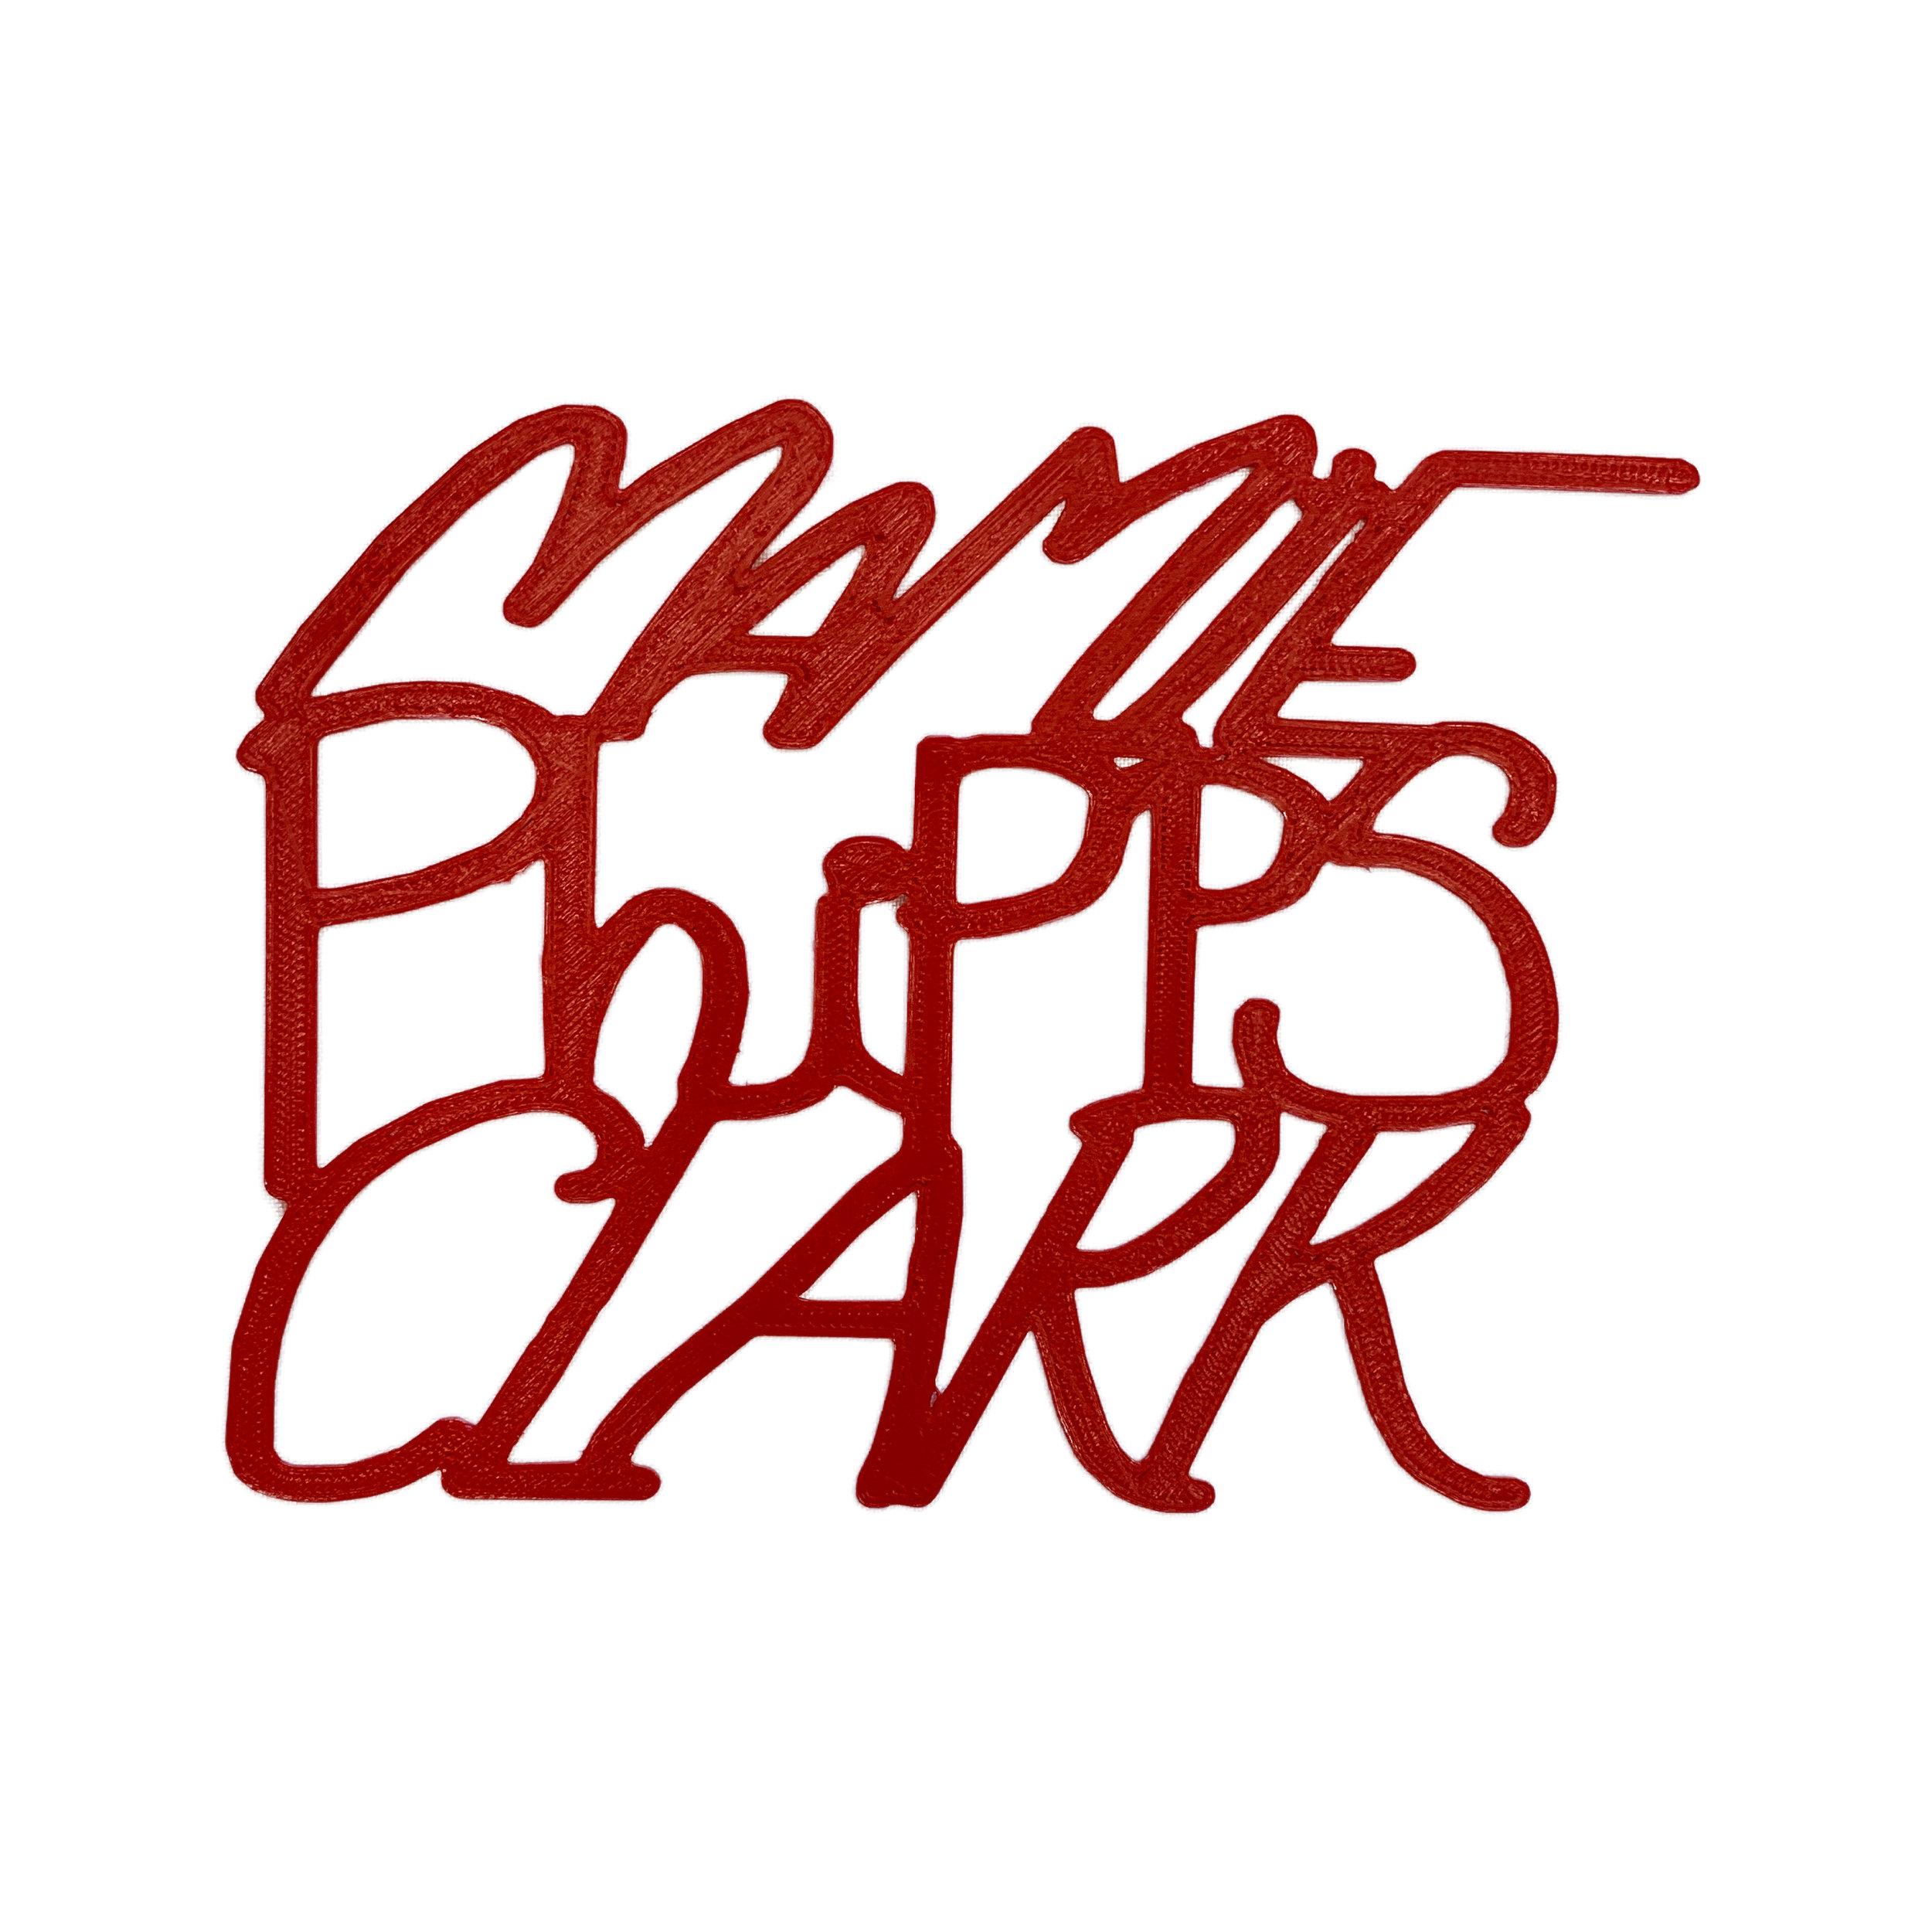 Mamie-Phipps-ClarkNoBackground.jpg